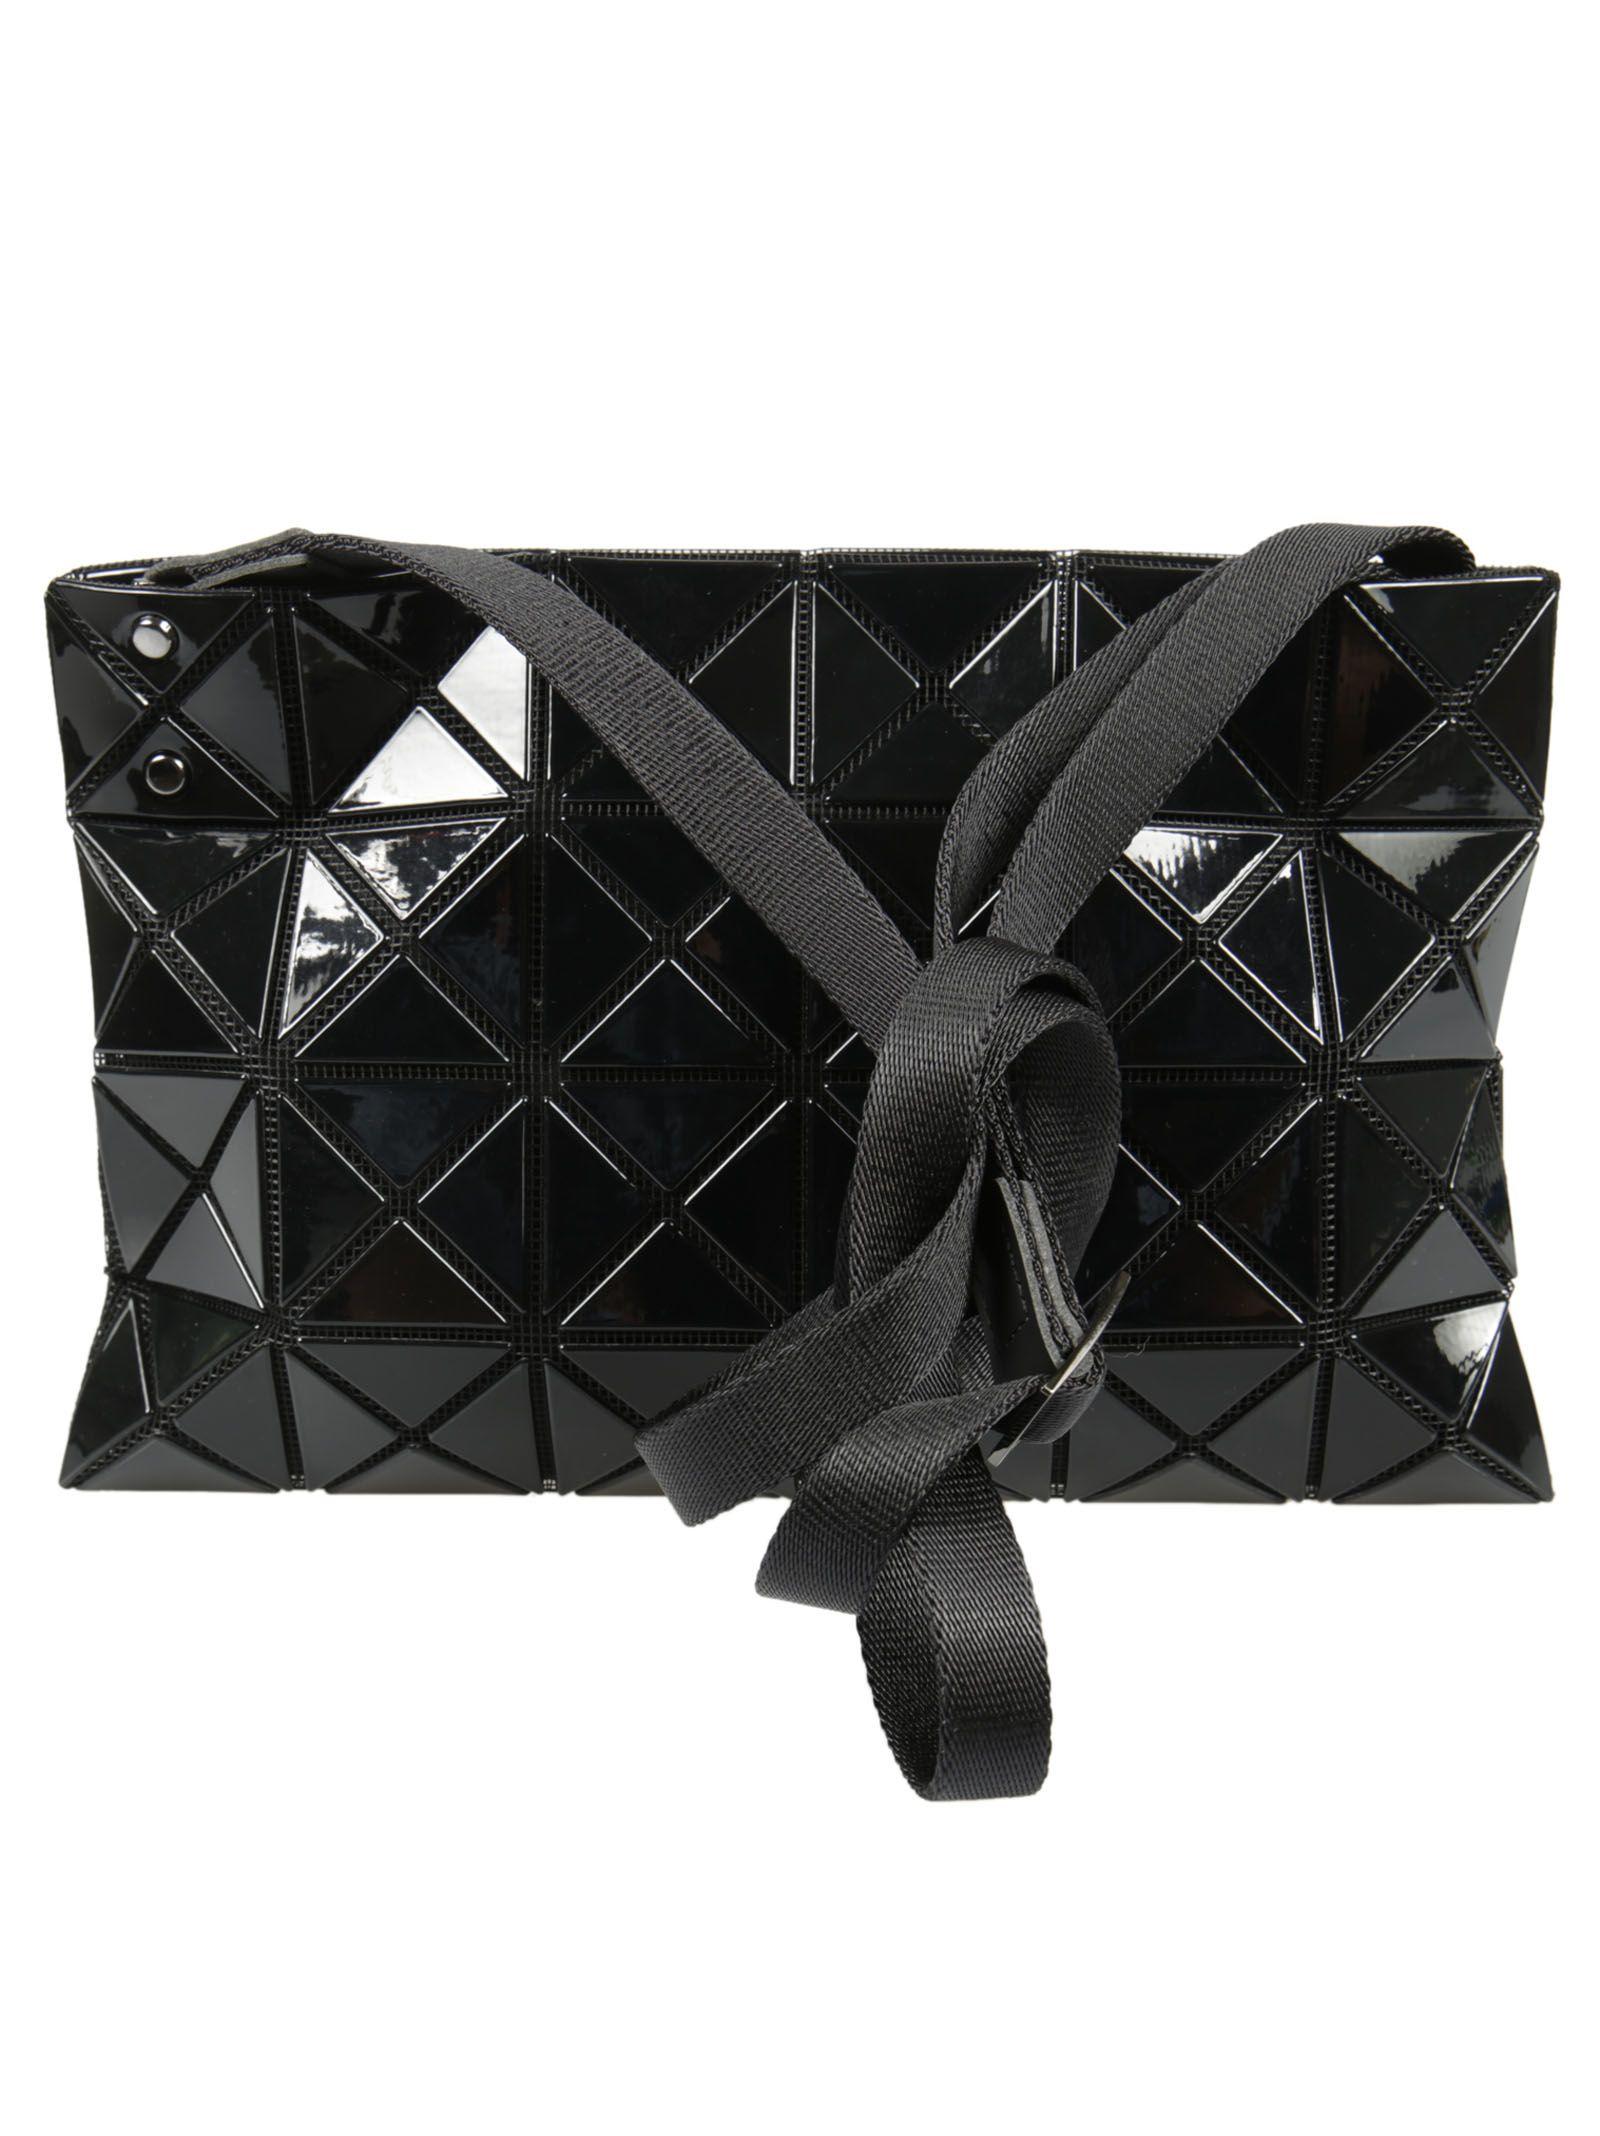 5fd7bd0e548c ... Bao Bao Issey Miyake Lucent Basics Shoulder Bag - Black